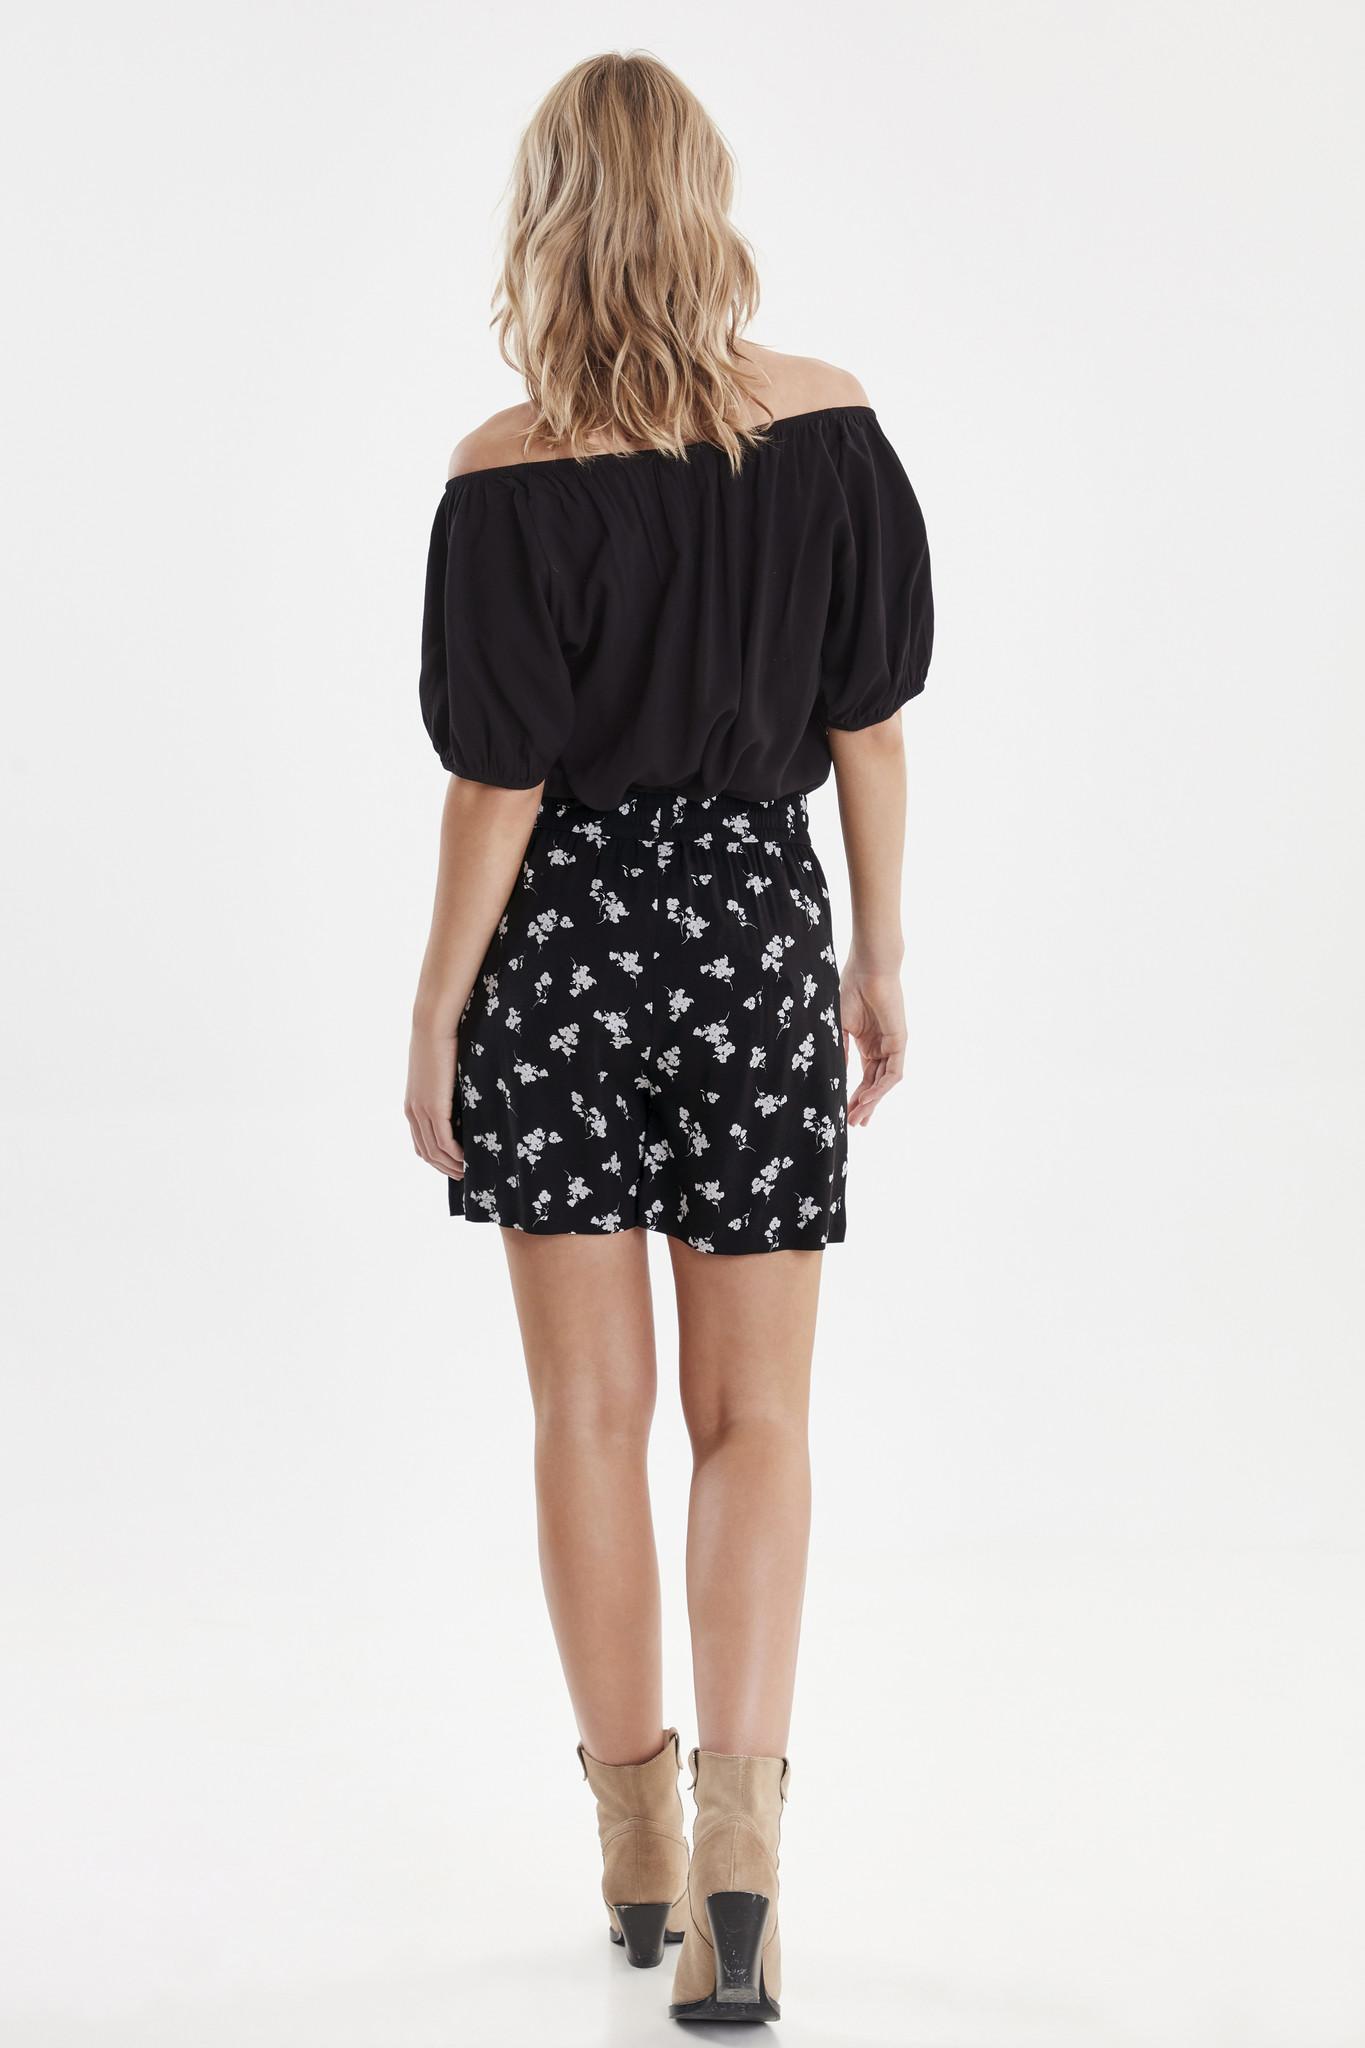 byisole shorts black combi 5-5